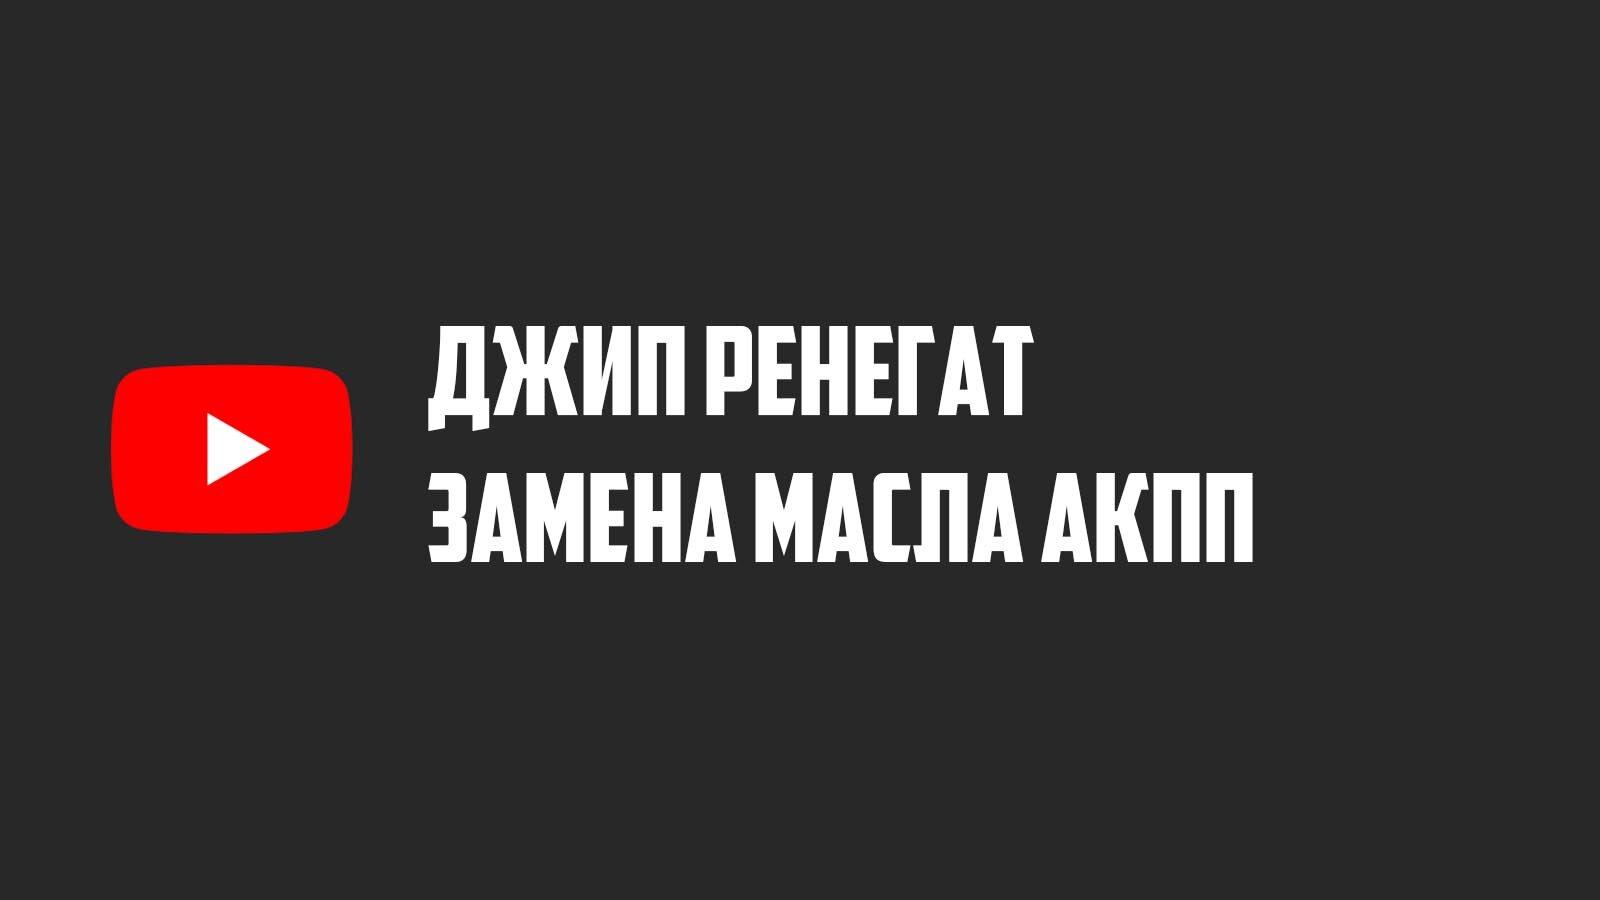 Замена масла АКПП Джип Ренегат 1.4